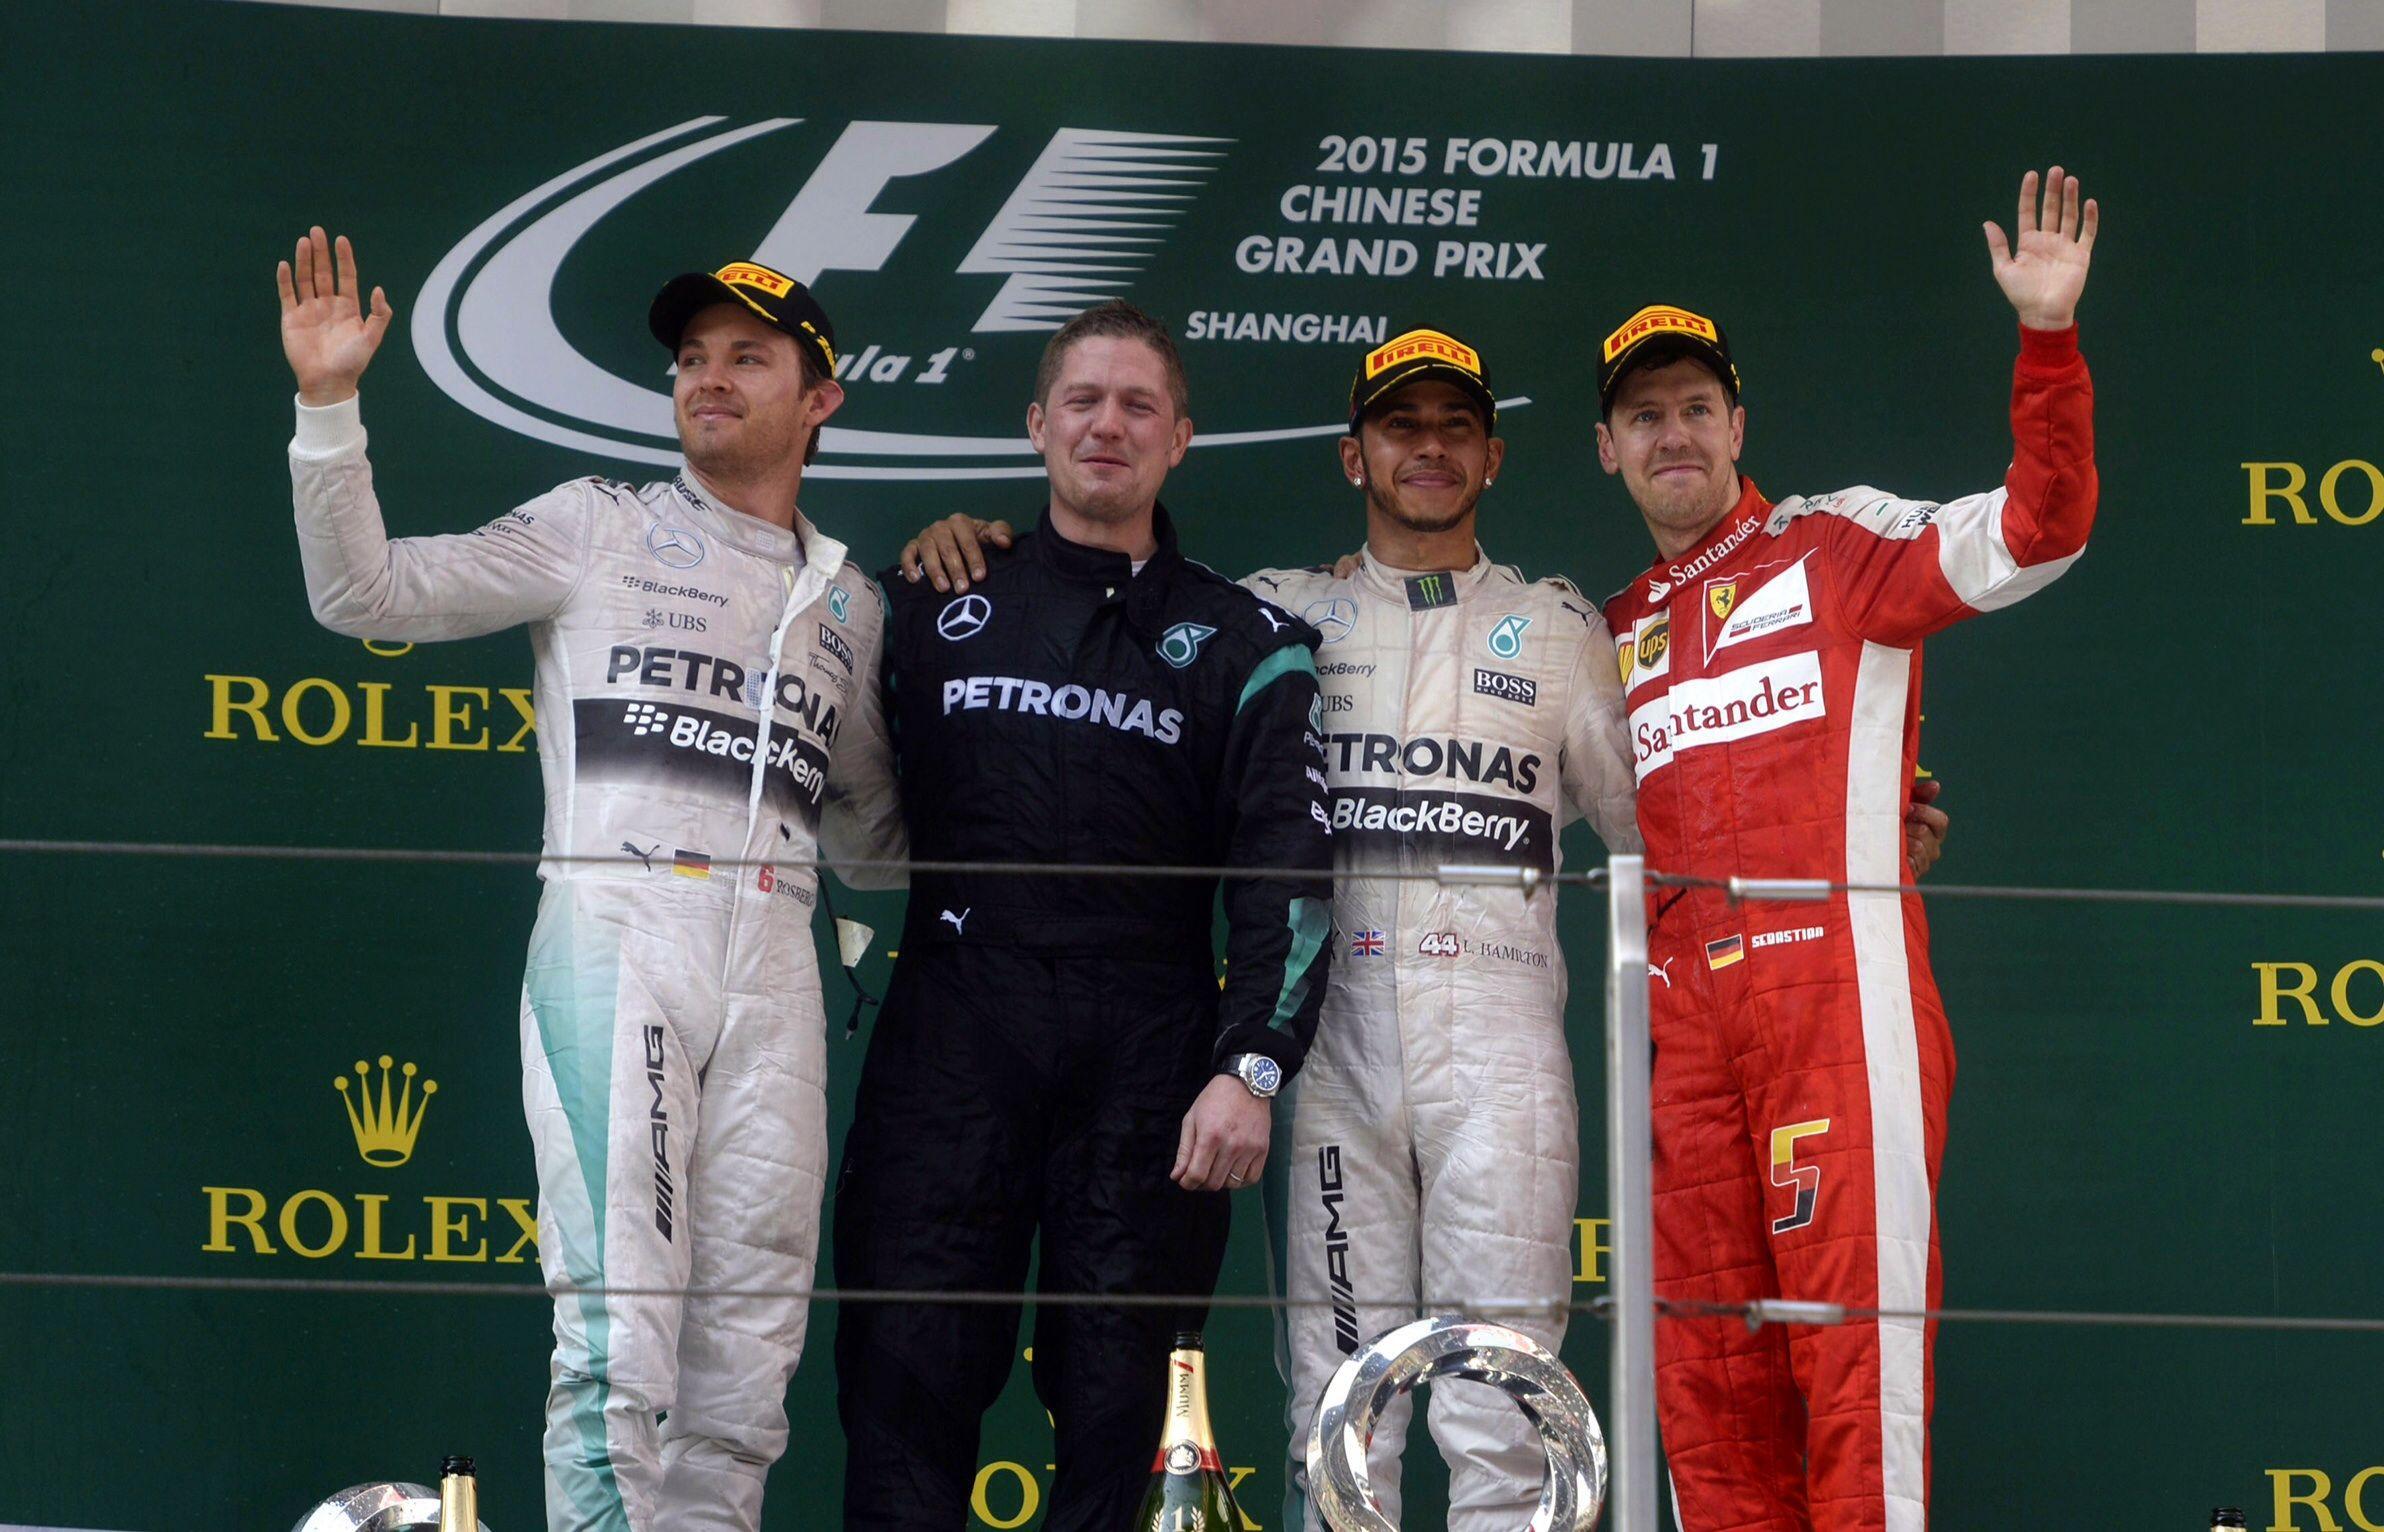 F1 Νίκη για Χάμιλτον στην Κίνα autoliveris Chinese